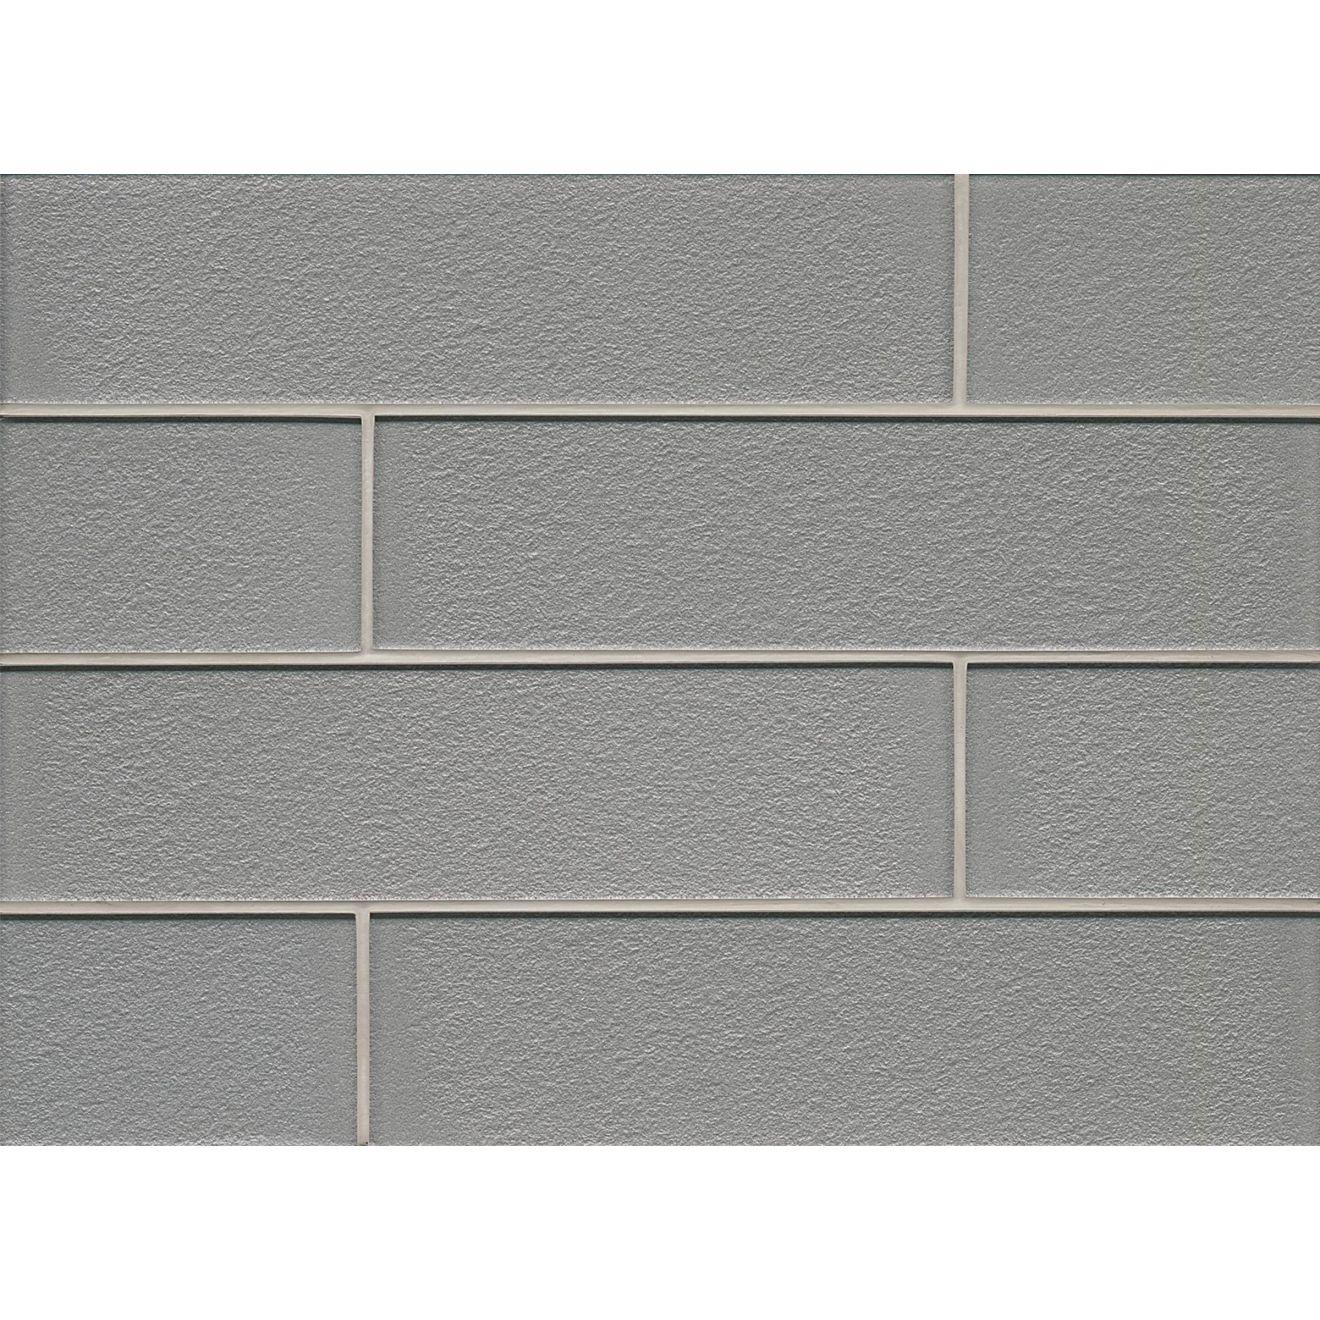 "Manhattan 4"" x 16"" Wall Tile in Platinum"